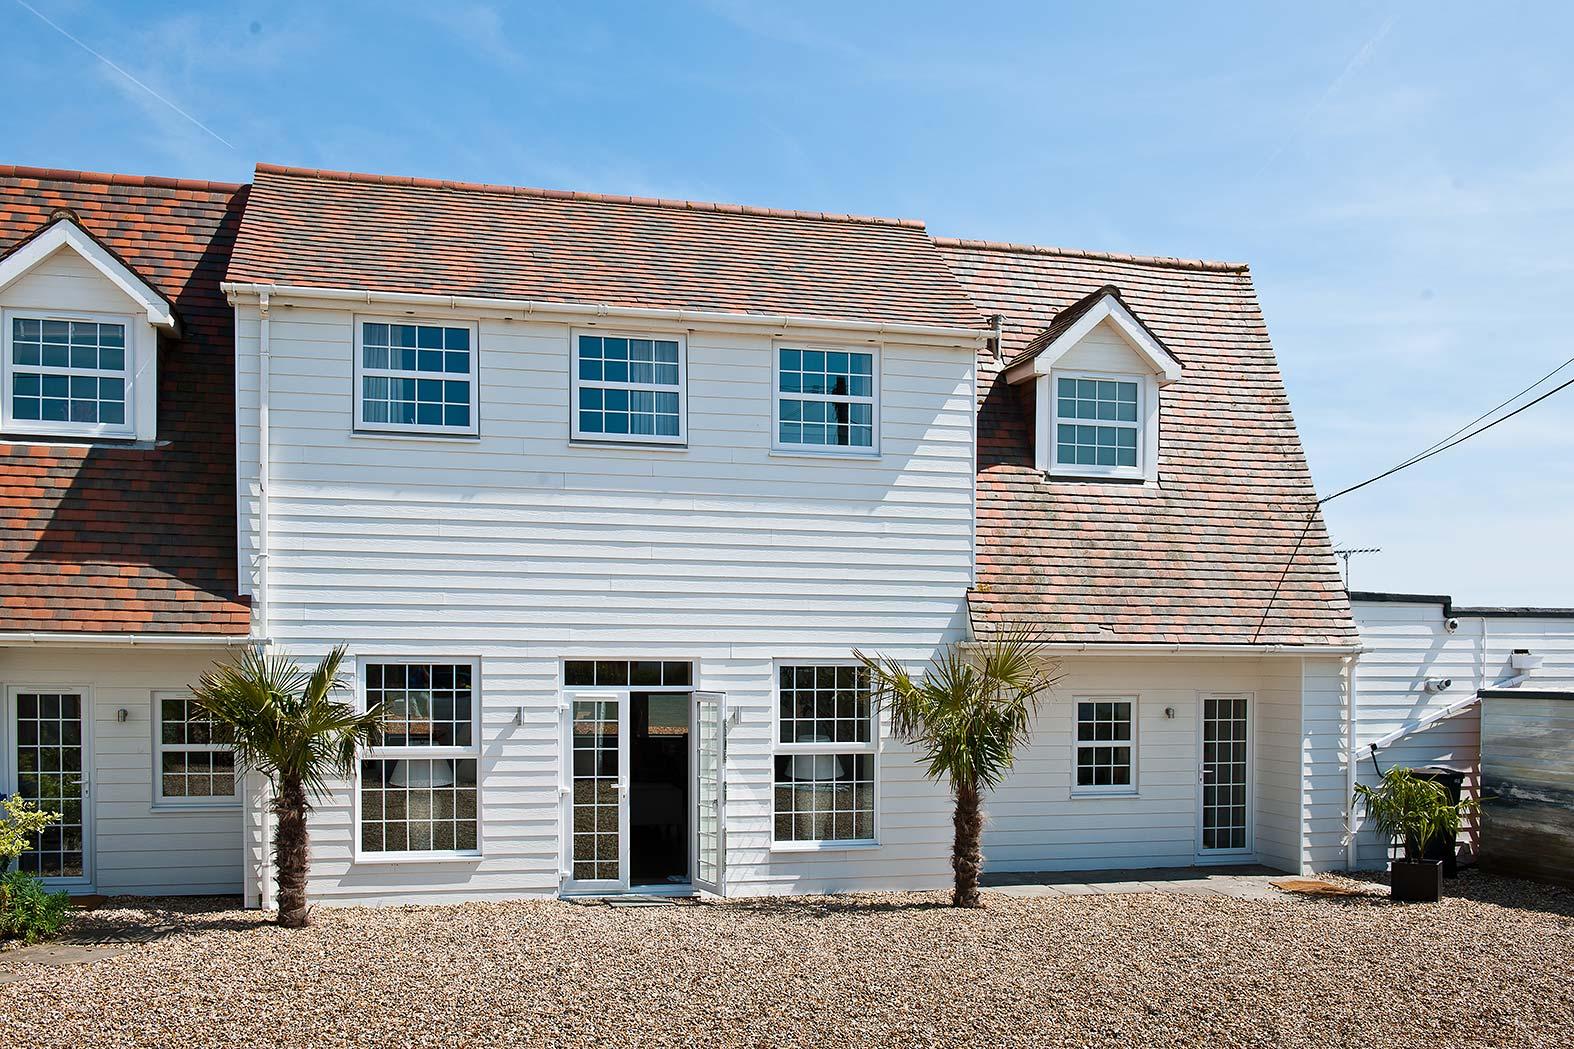 West sussex luxury beach houses luxury beach house rental for Luxury beach houses